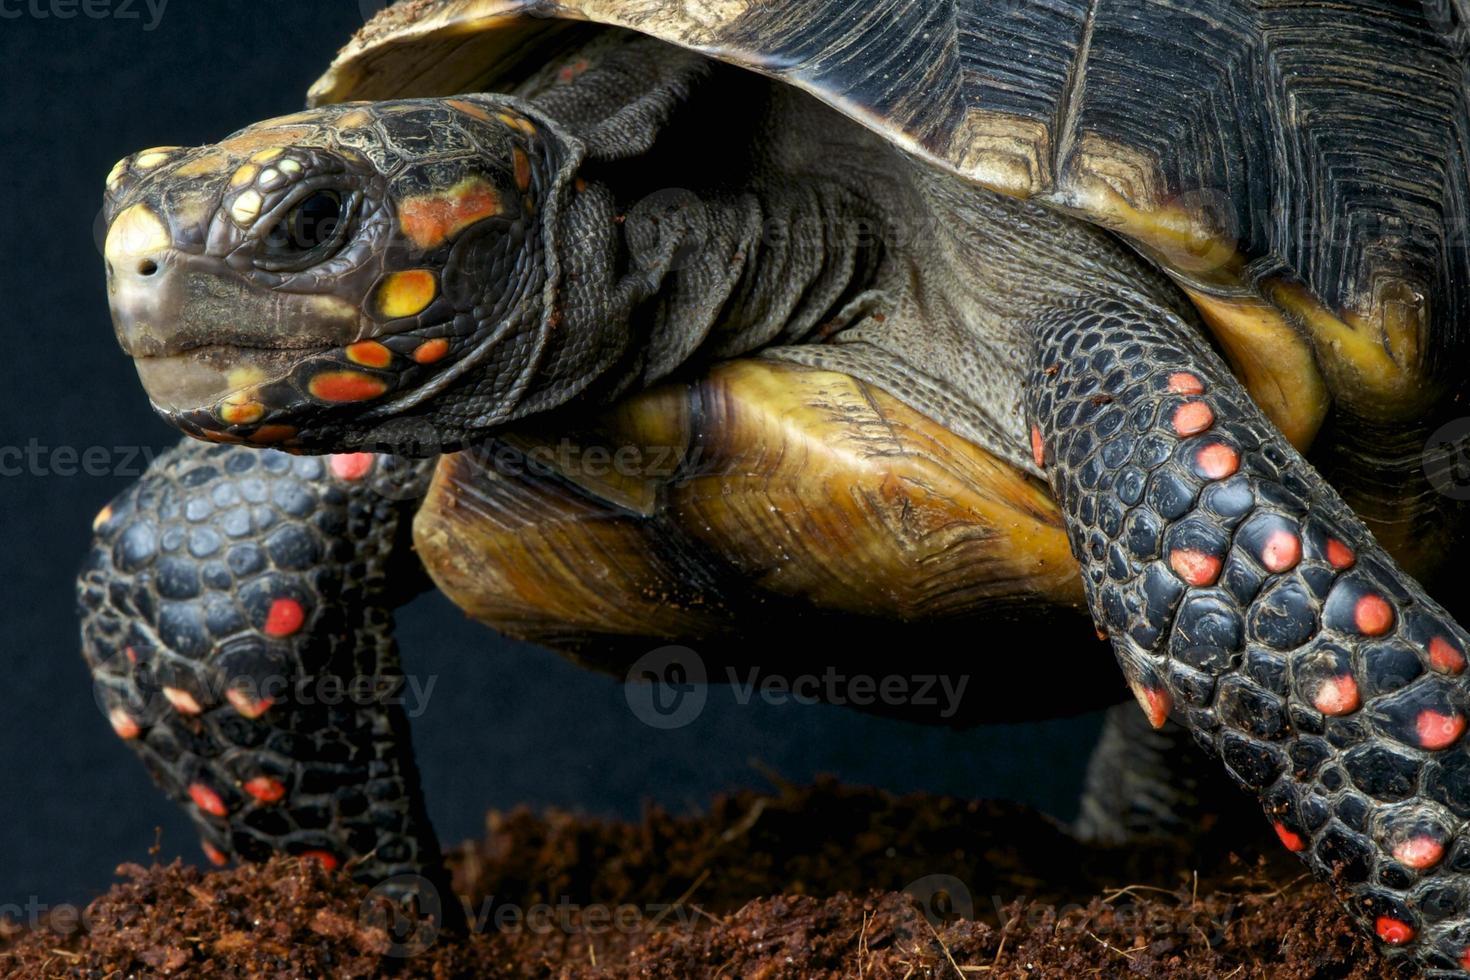 tartaruga-de-patas-vermelhas / chelonoides carbonaria foto